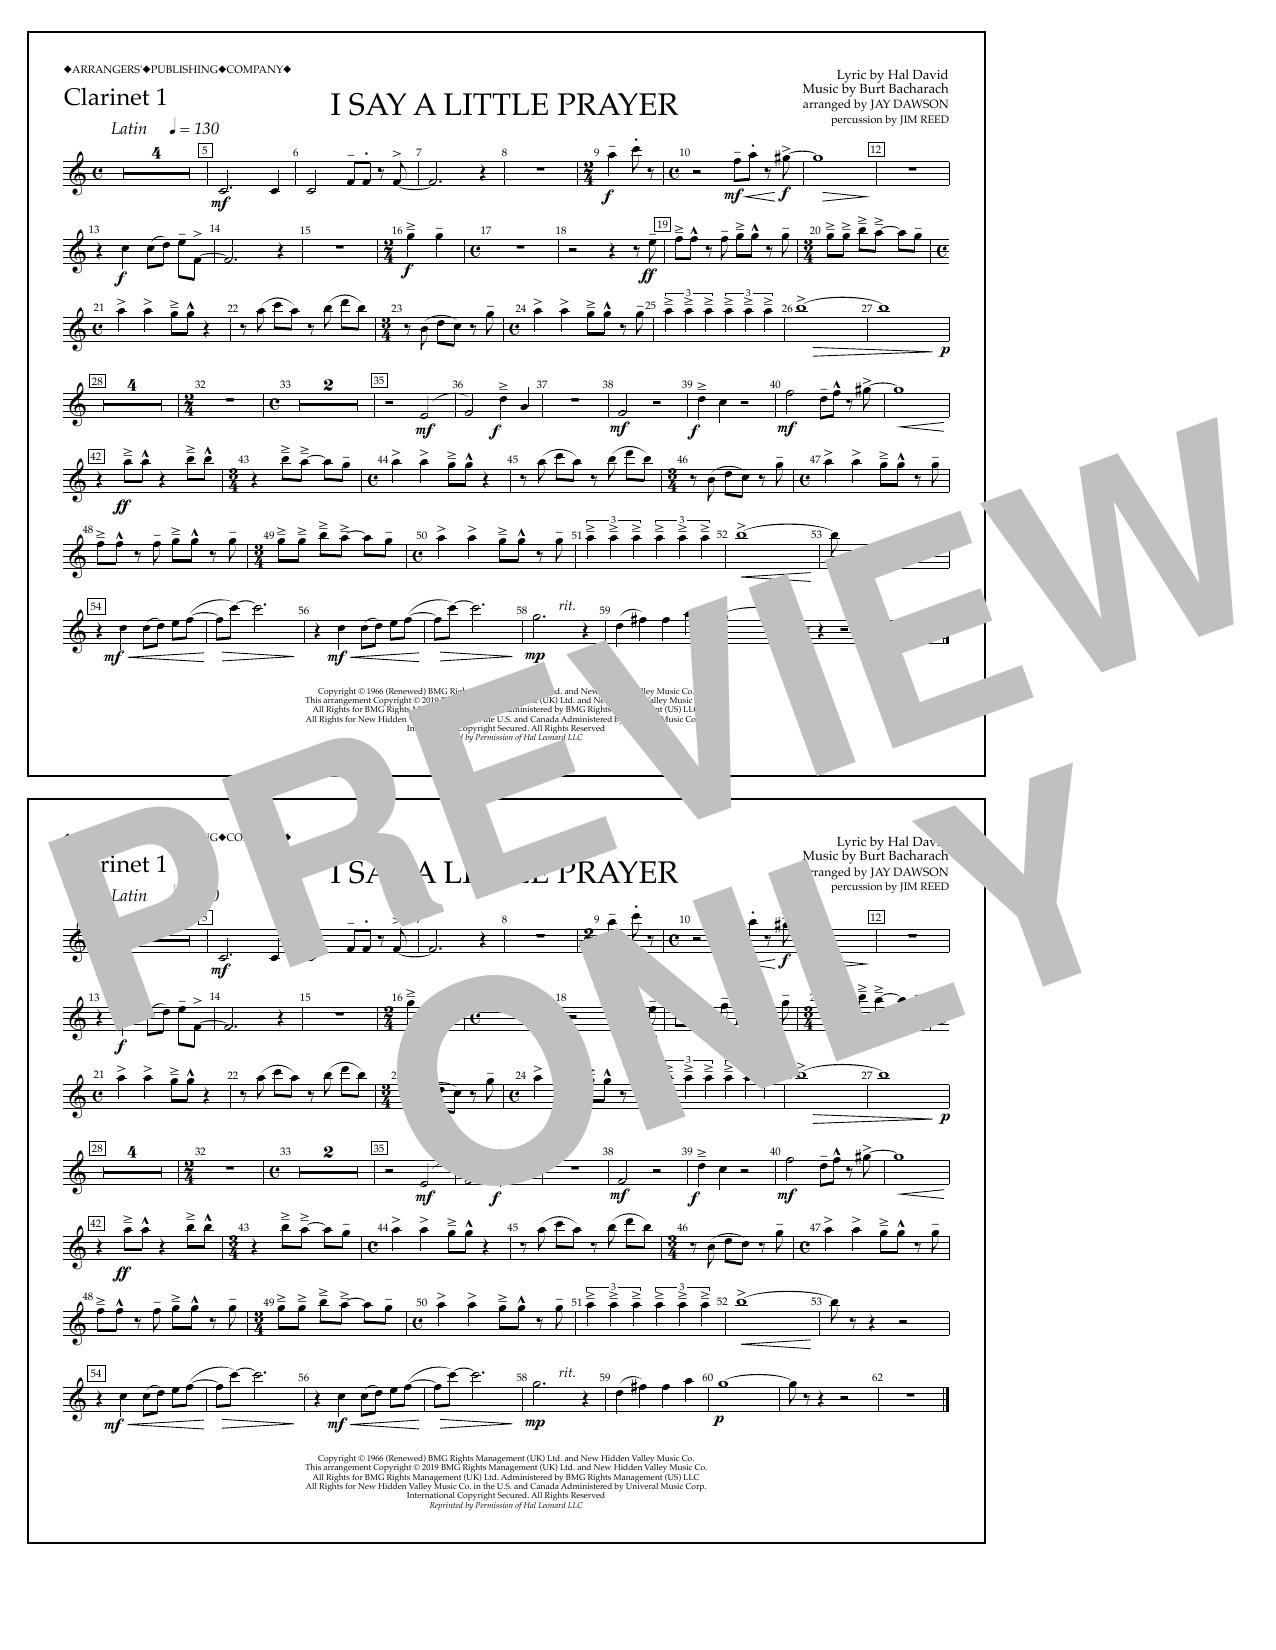 Aretha Franklin I Say a Little Prayer (arr. Jay Dawson) - Clarinet 1 sheet music notes and chords